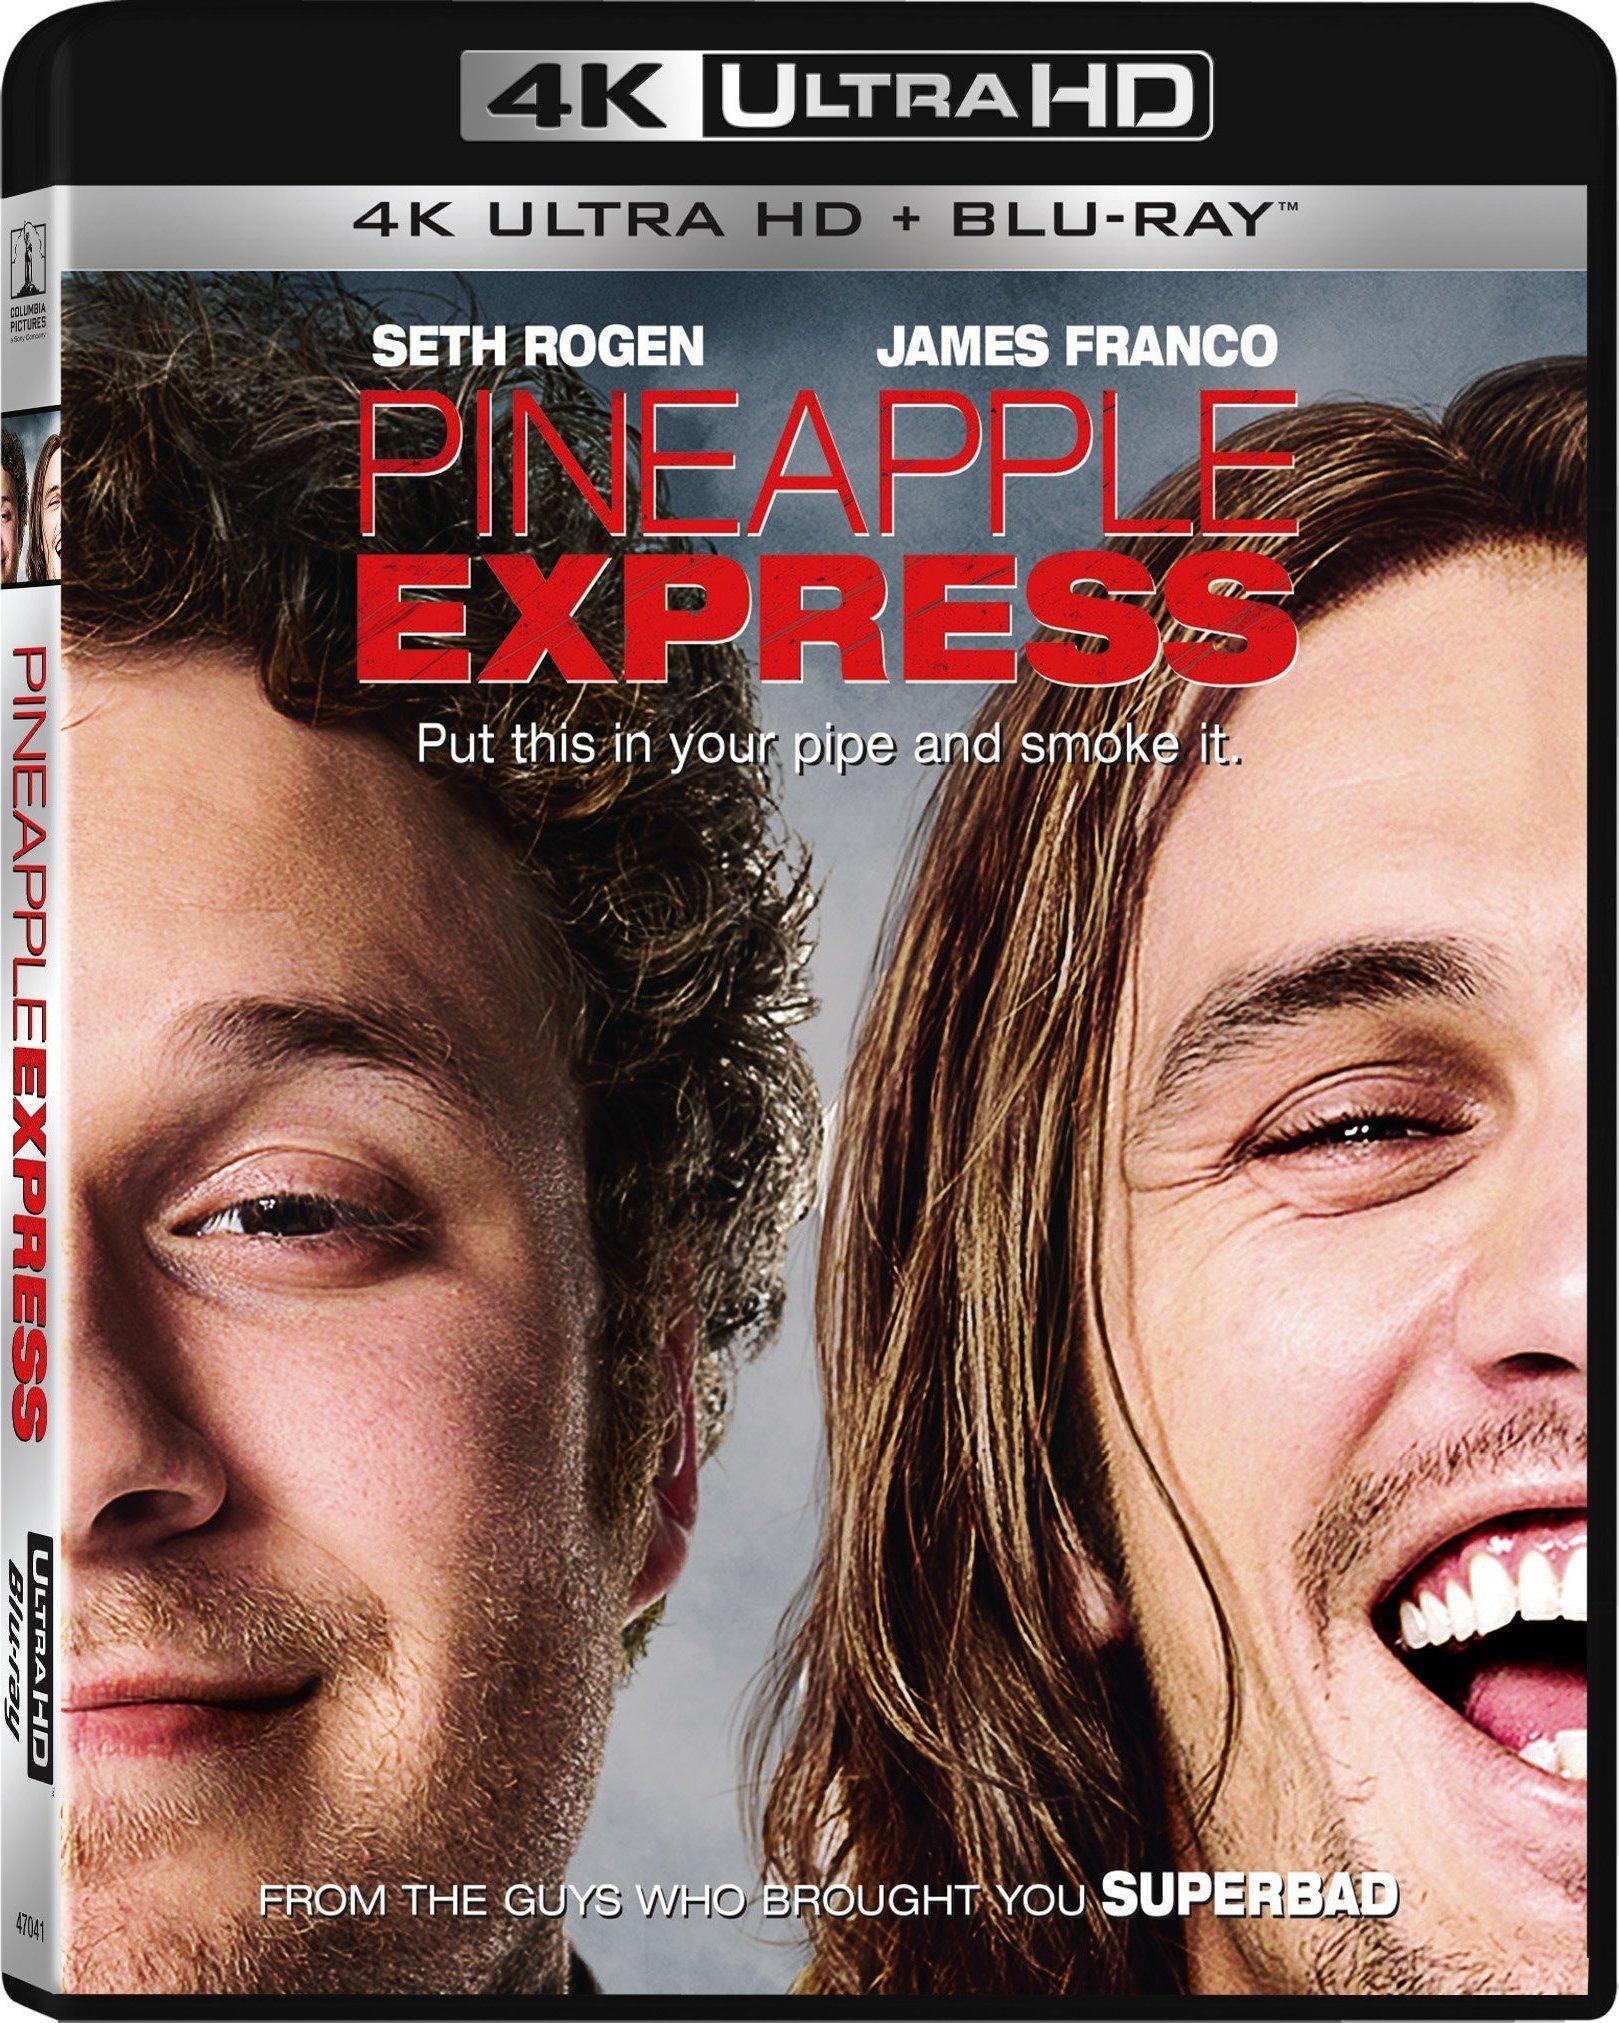 Pineapple Express (2008) 4K Ultra HD Blu-ray